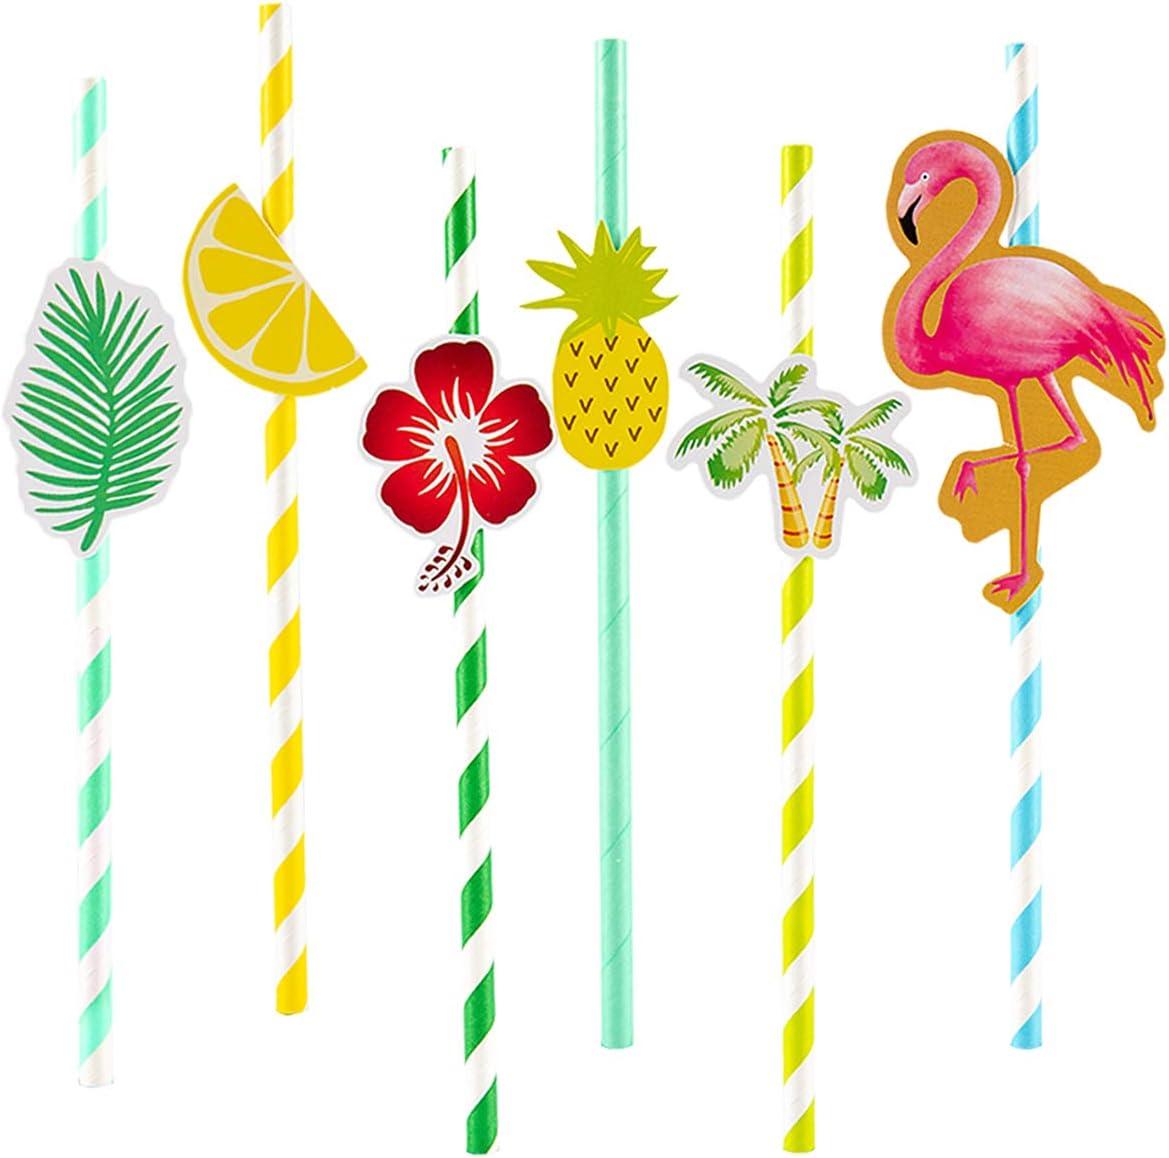 PAMASE 60 pcs Ranking TOP20 Hawaiian Ranking TOP12 Party Tropical Paper Straws Striped Decor